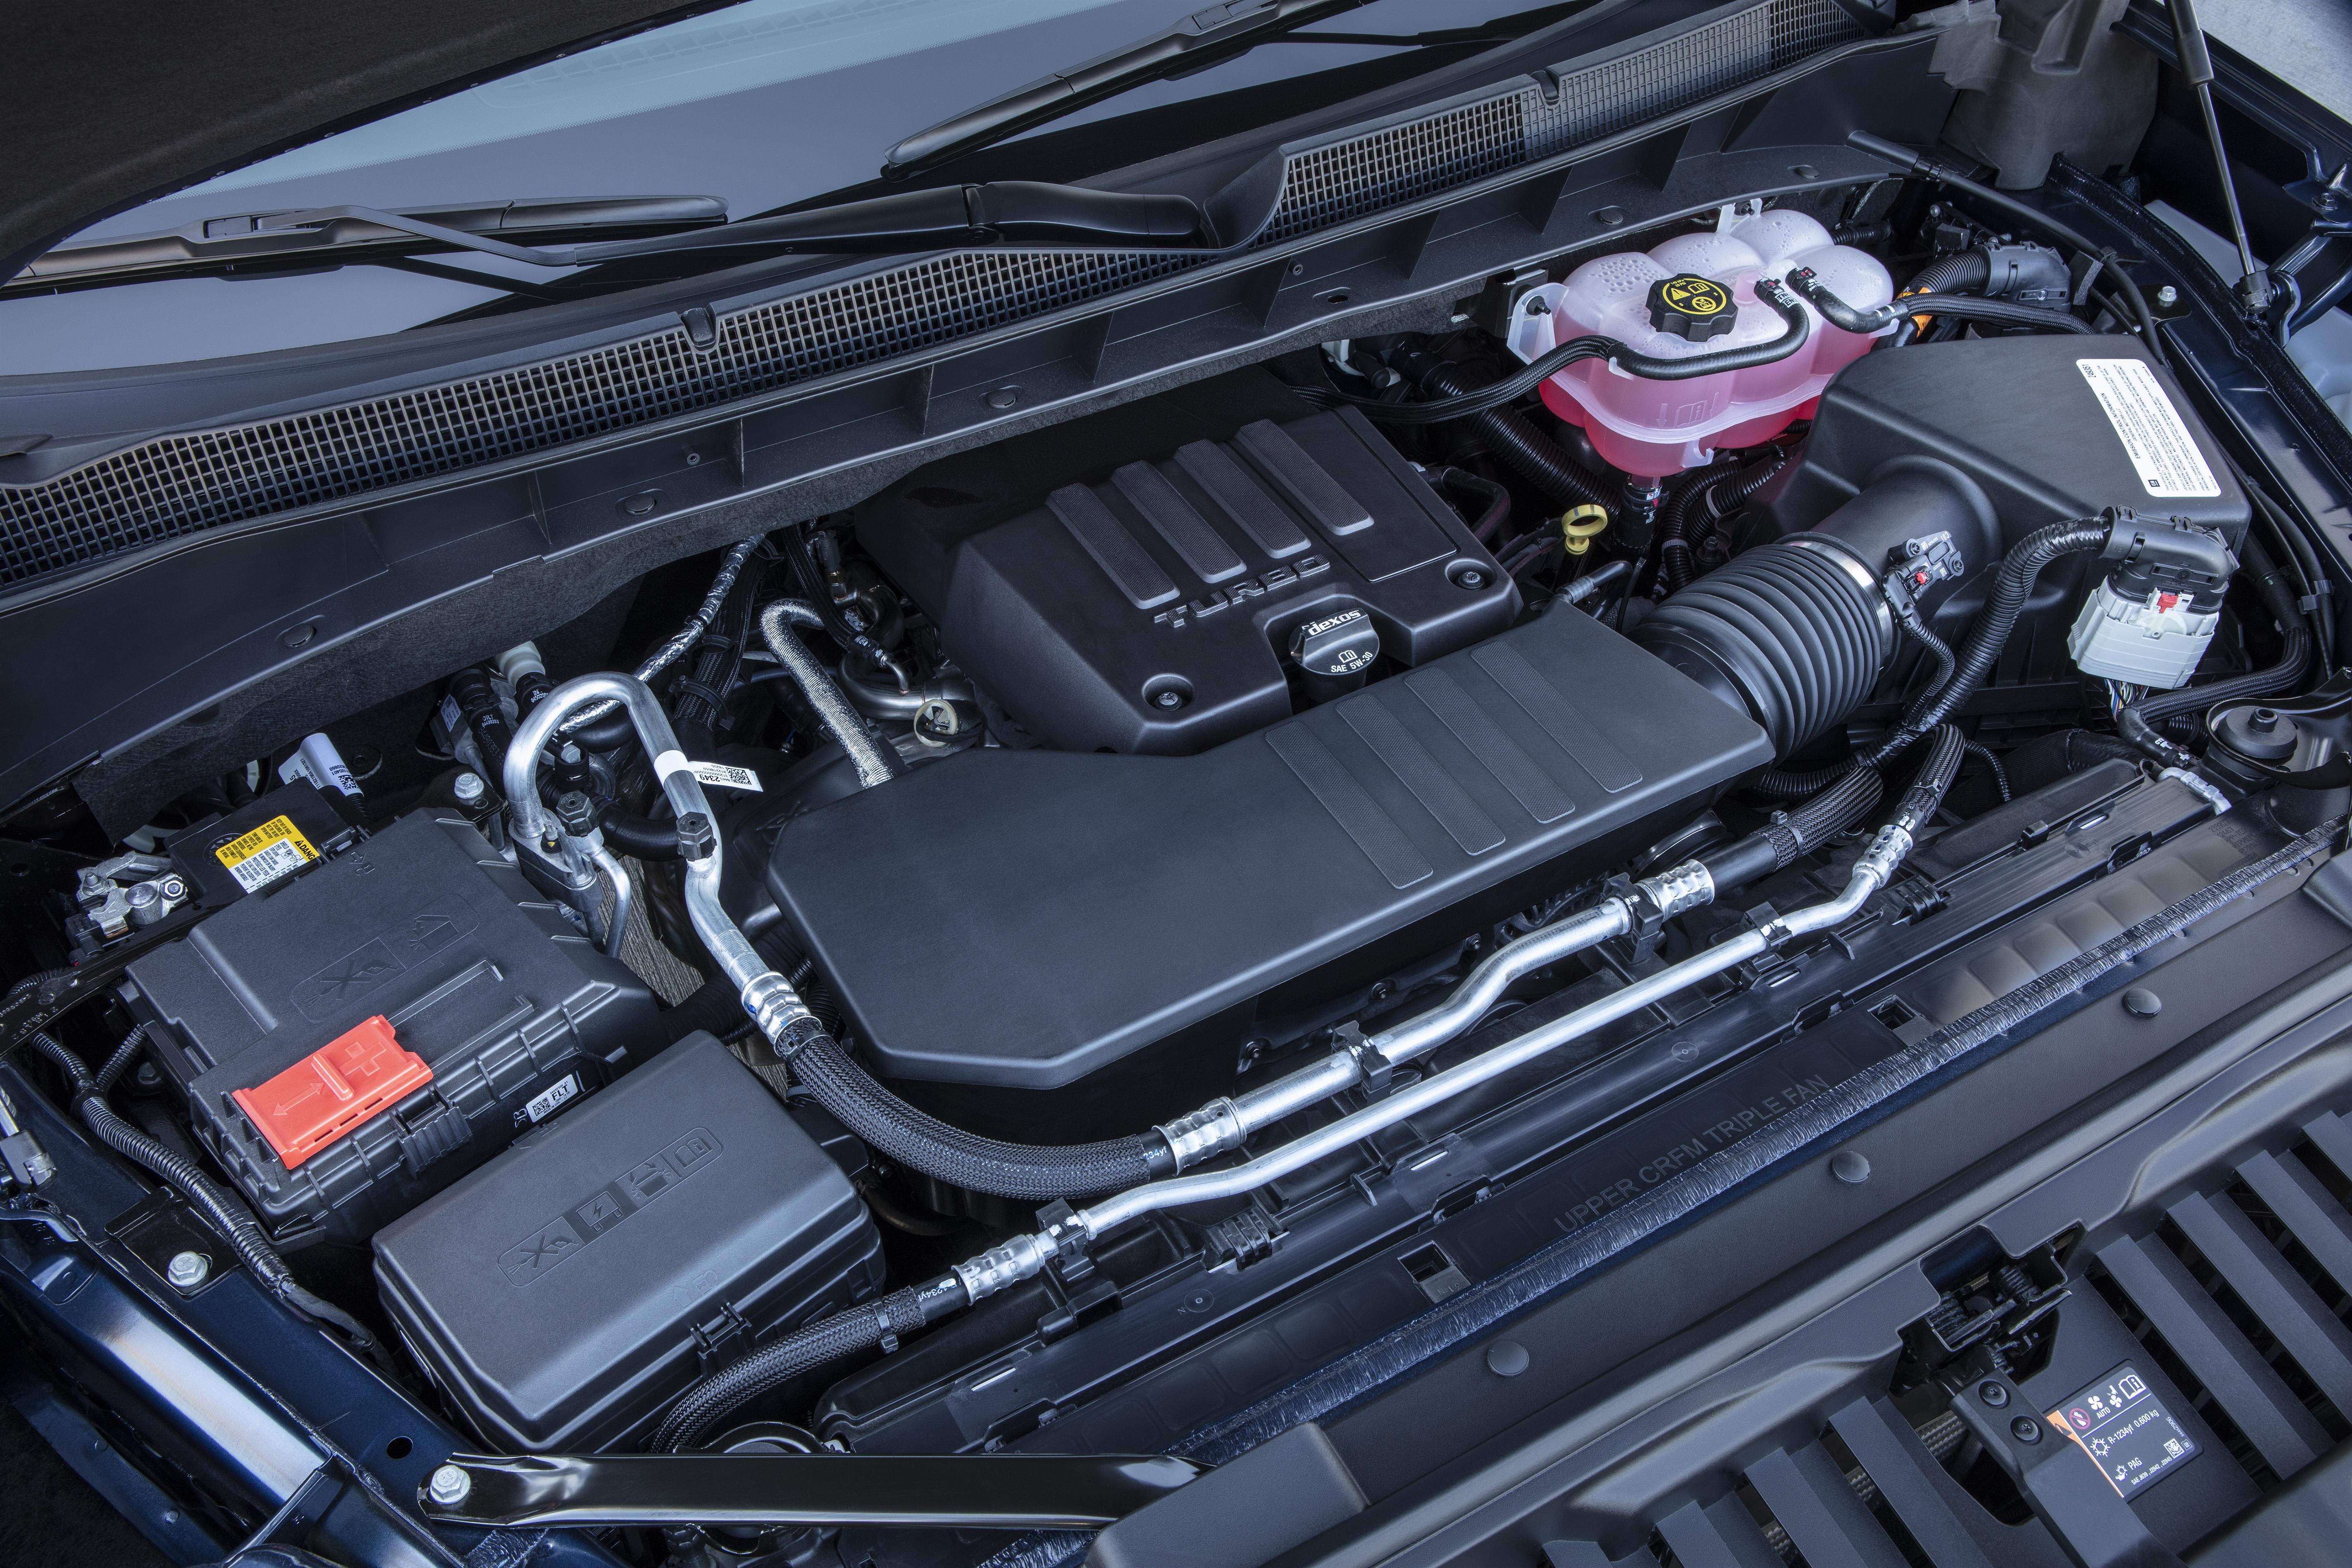 Small Engine, Big Truck: 2019 Silverado 4-Cylinder Turbo Review | GearJunkie